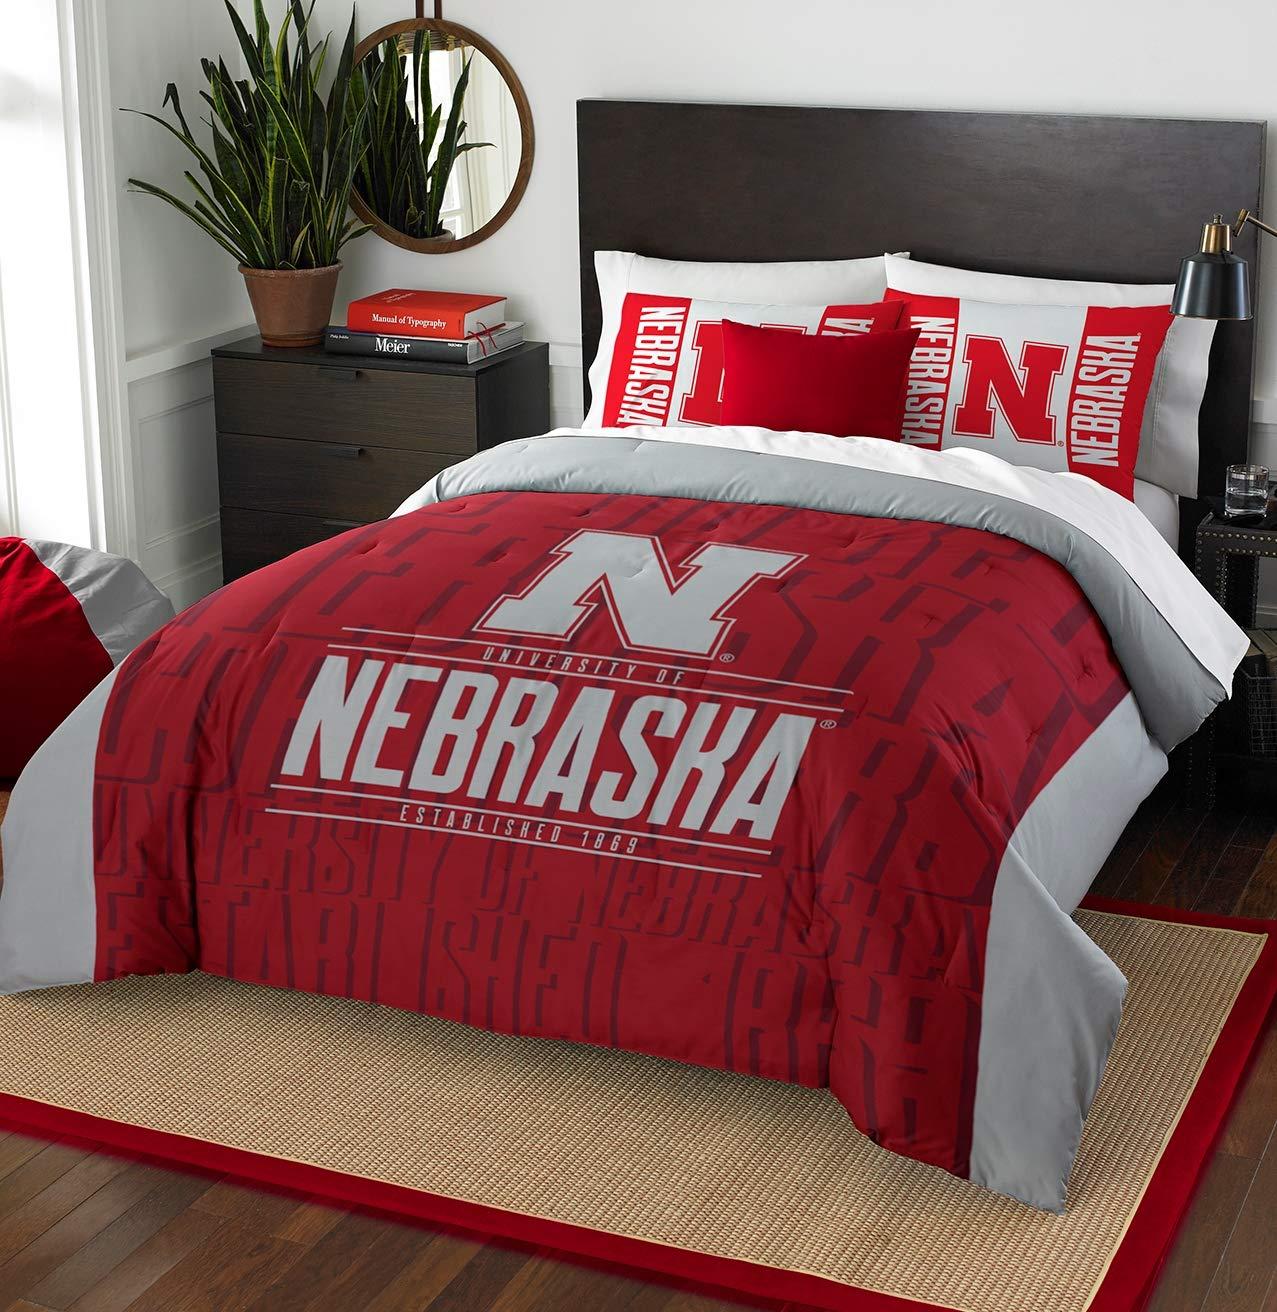 NCAA Nebraska Cornhuskers Modern Take Full/Queen Comforter Set #55112697 by Northwest